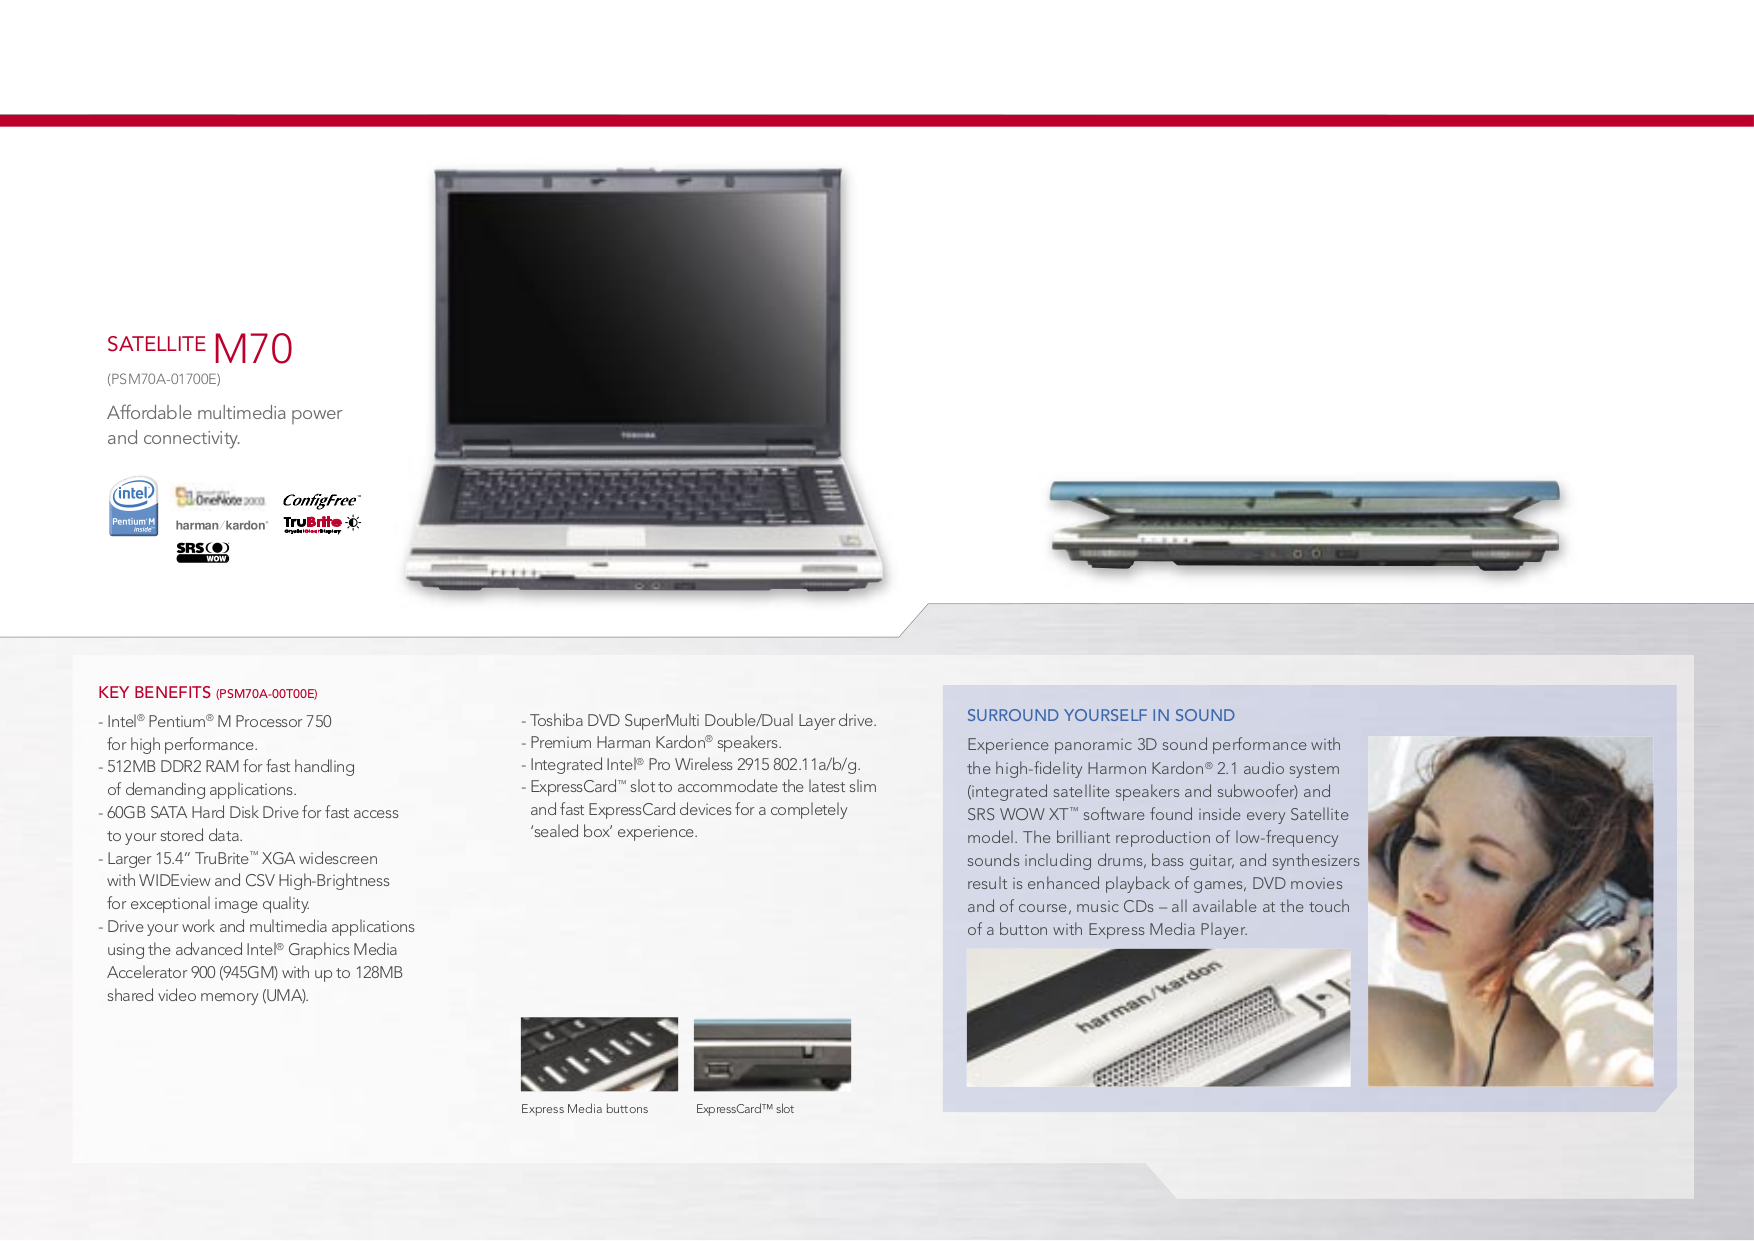 pdf manual for toshiba mp3 player gigabeat meg f40 rh umlib com Toshiba TV Manual Toshiba Laptop User Manual